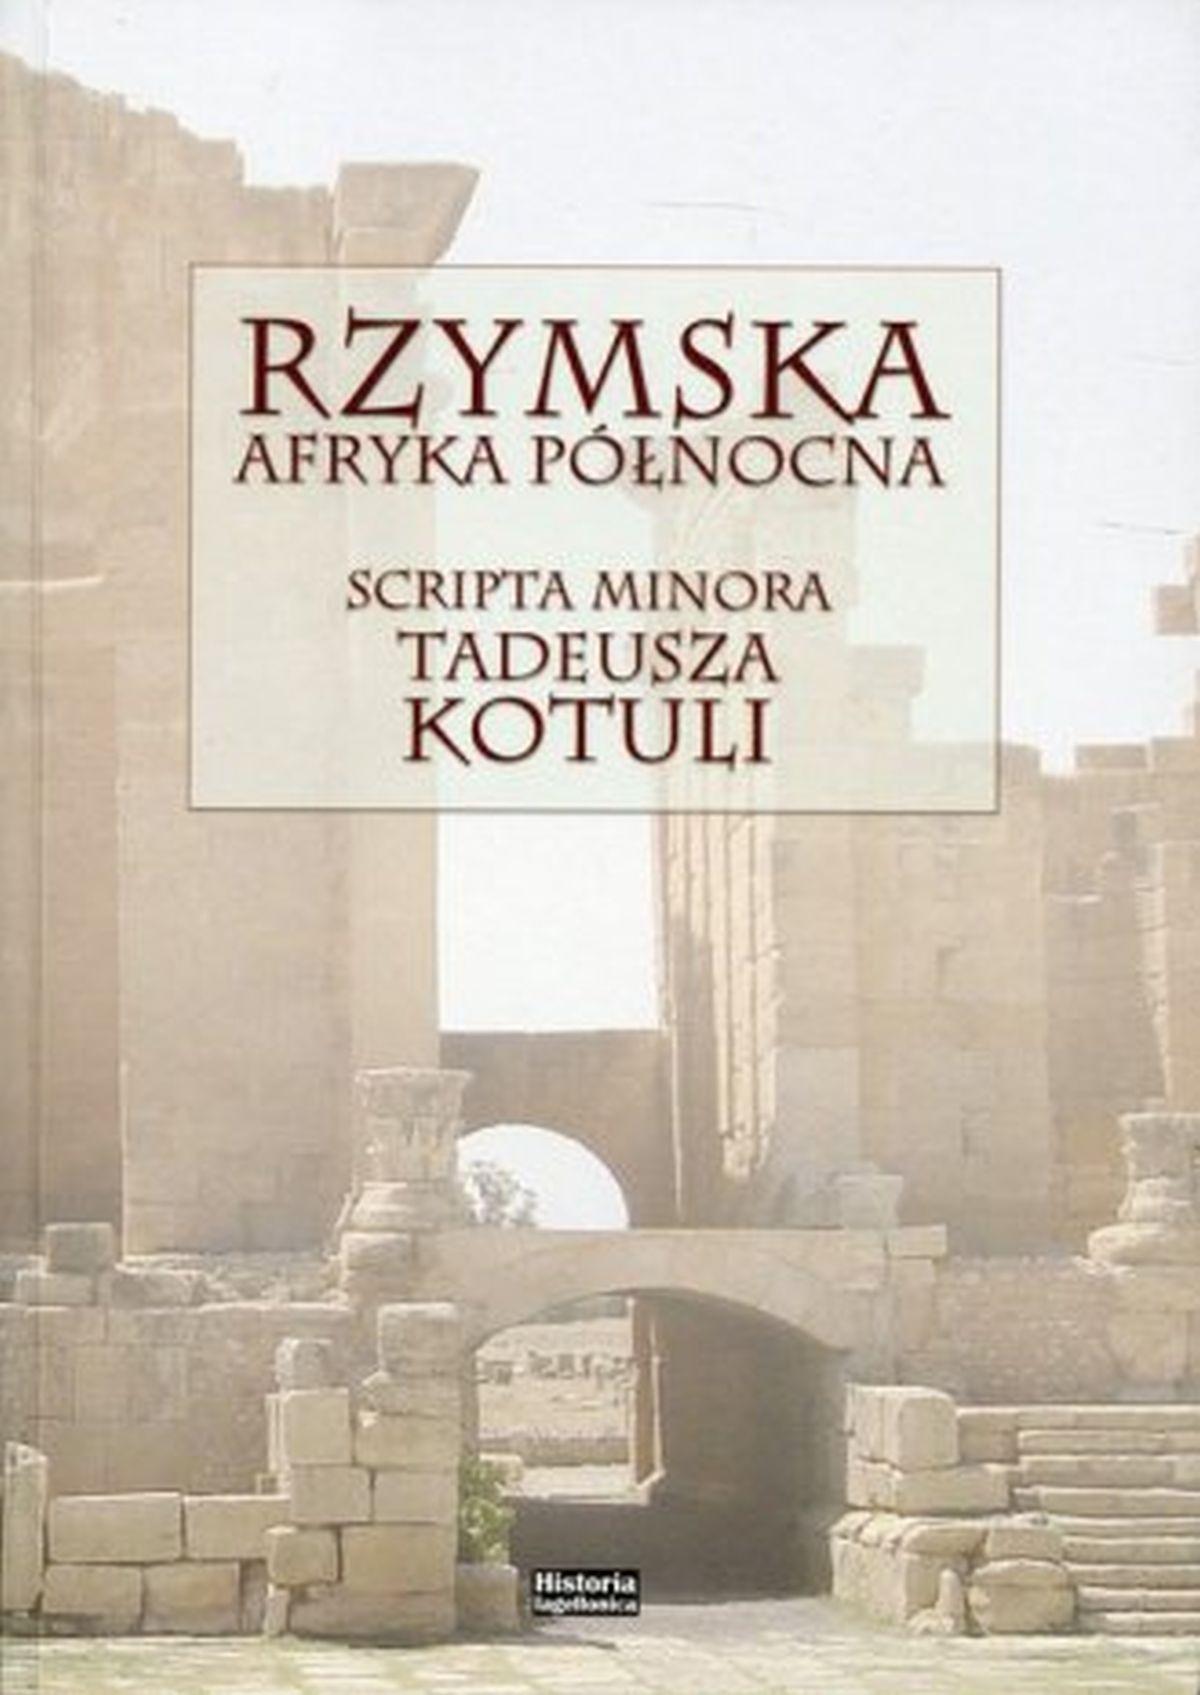 Rzymska Afryka Północna. Scripta minora Tadeusza Kotuli